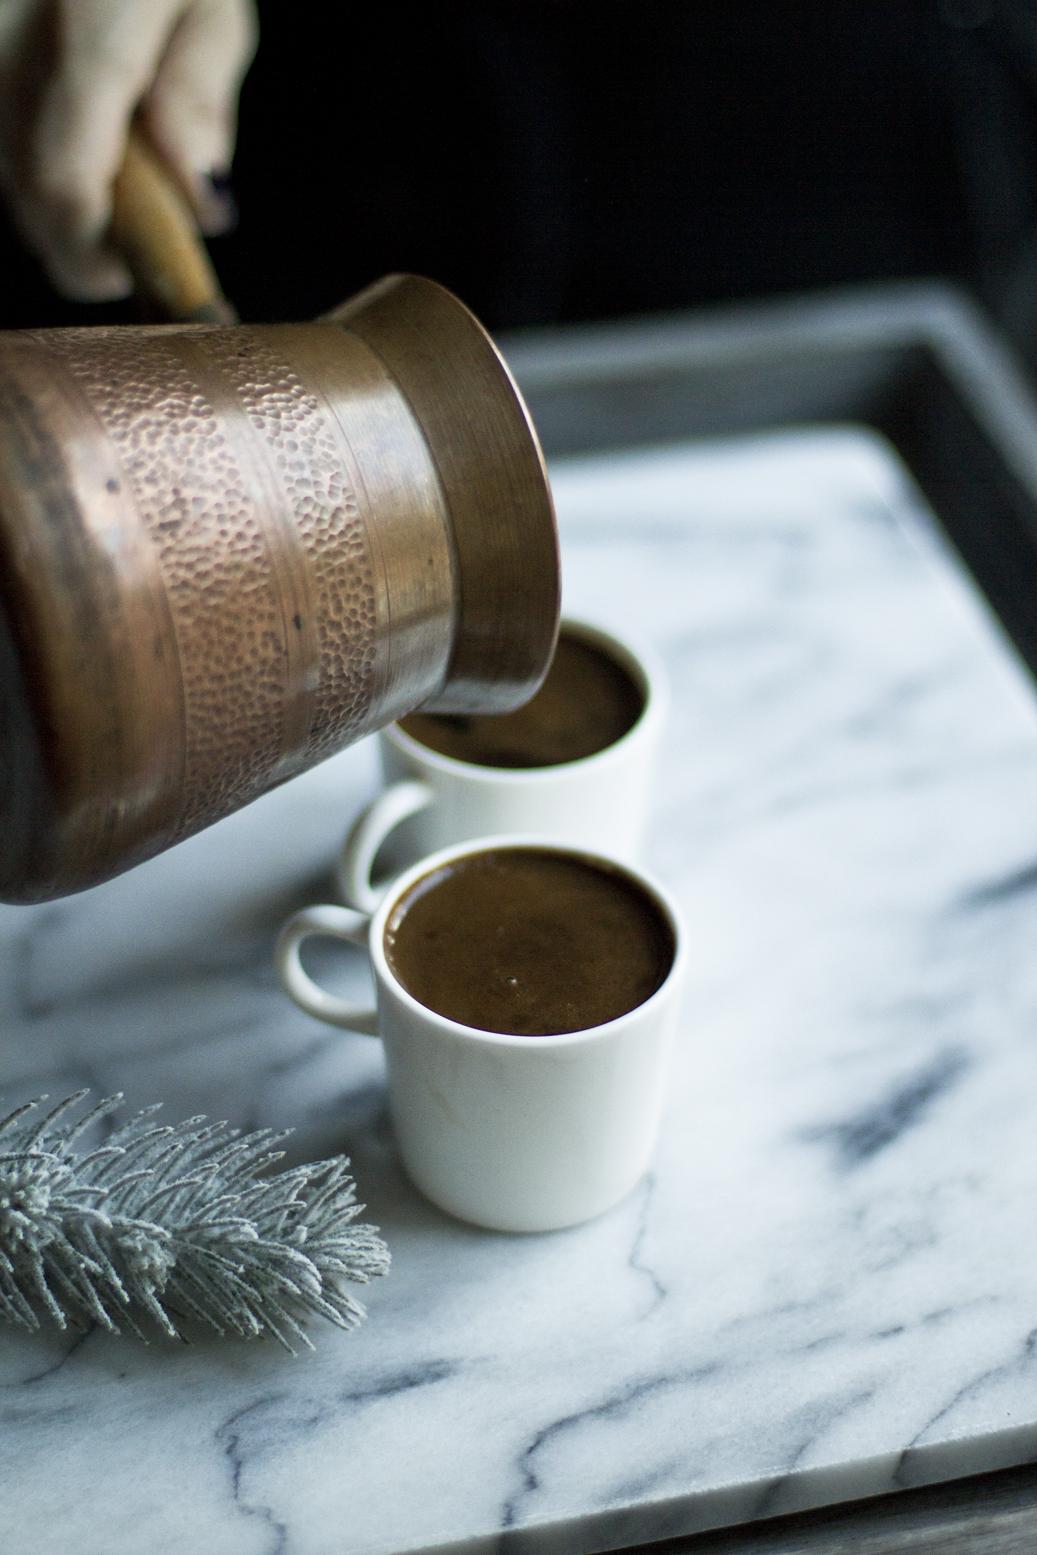 armeniancoffee.jpg